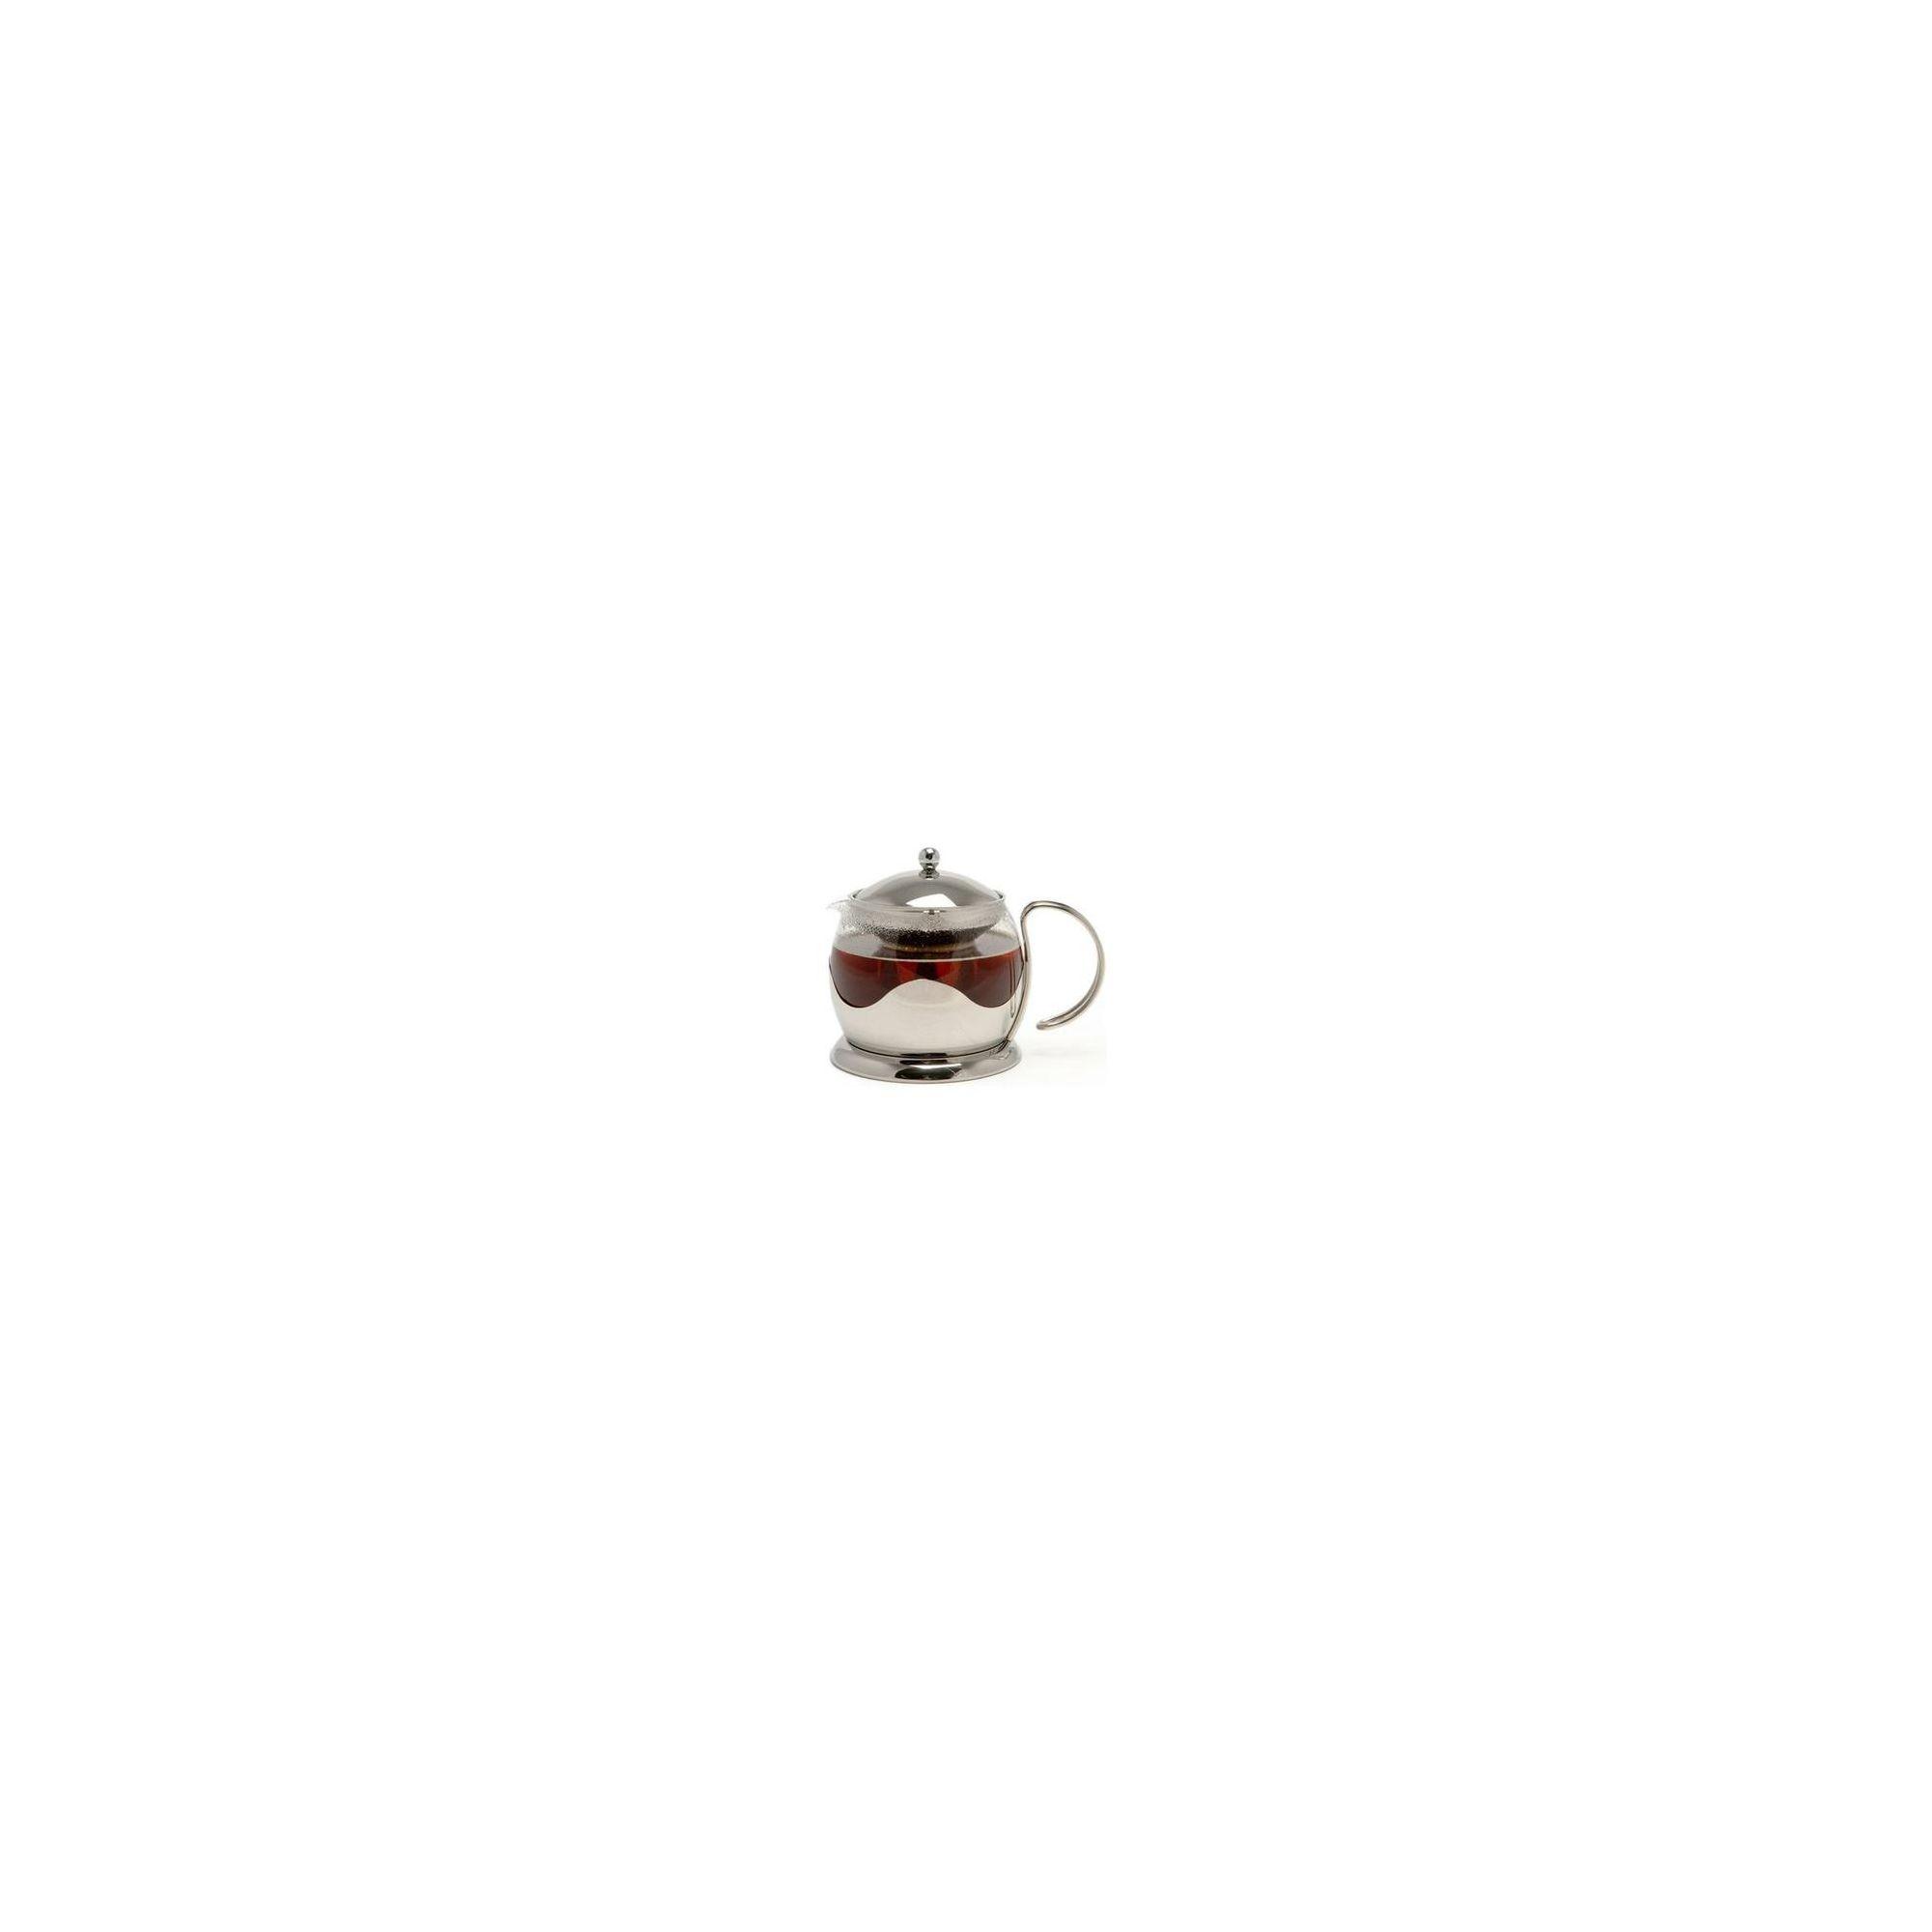 La Cafetiere TM970000 Le Teapot 0.66 litre in Stainless Steel